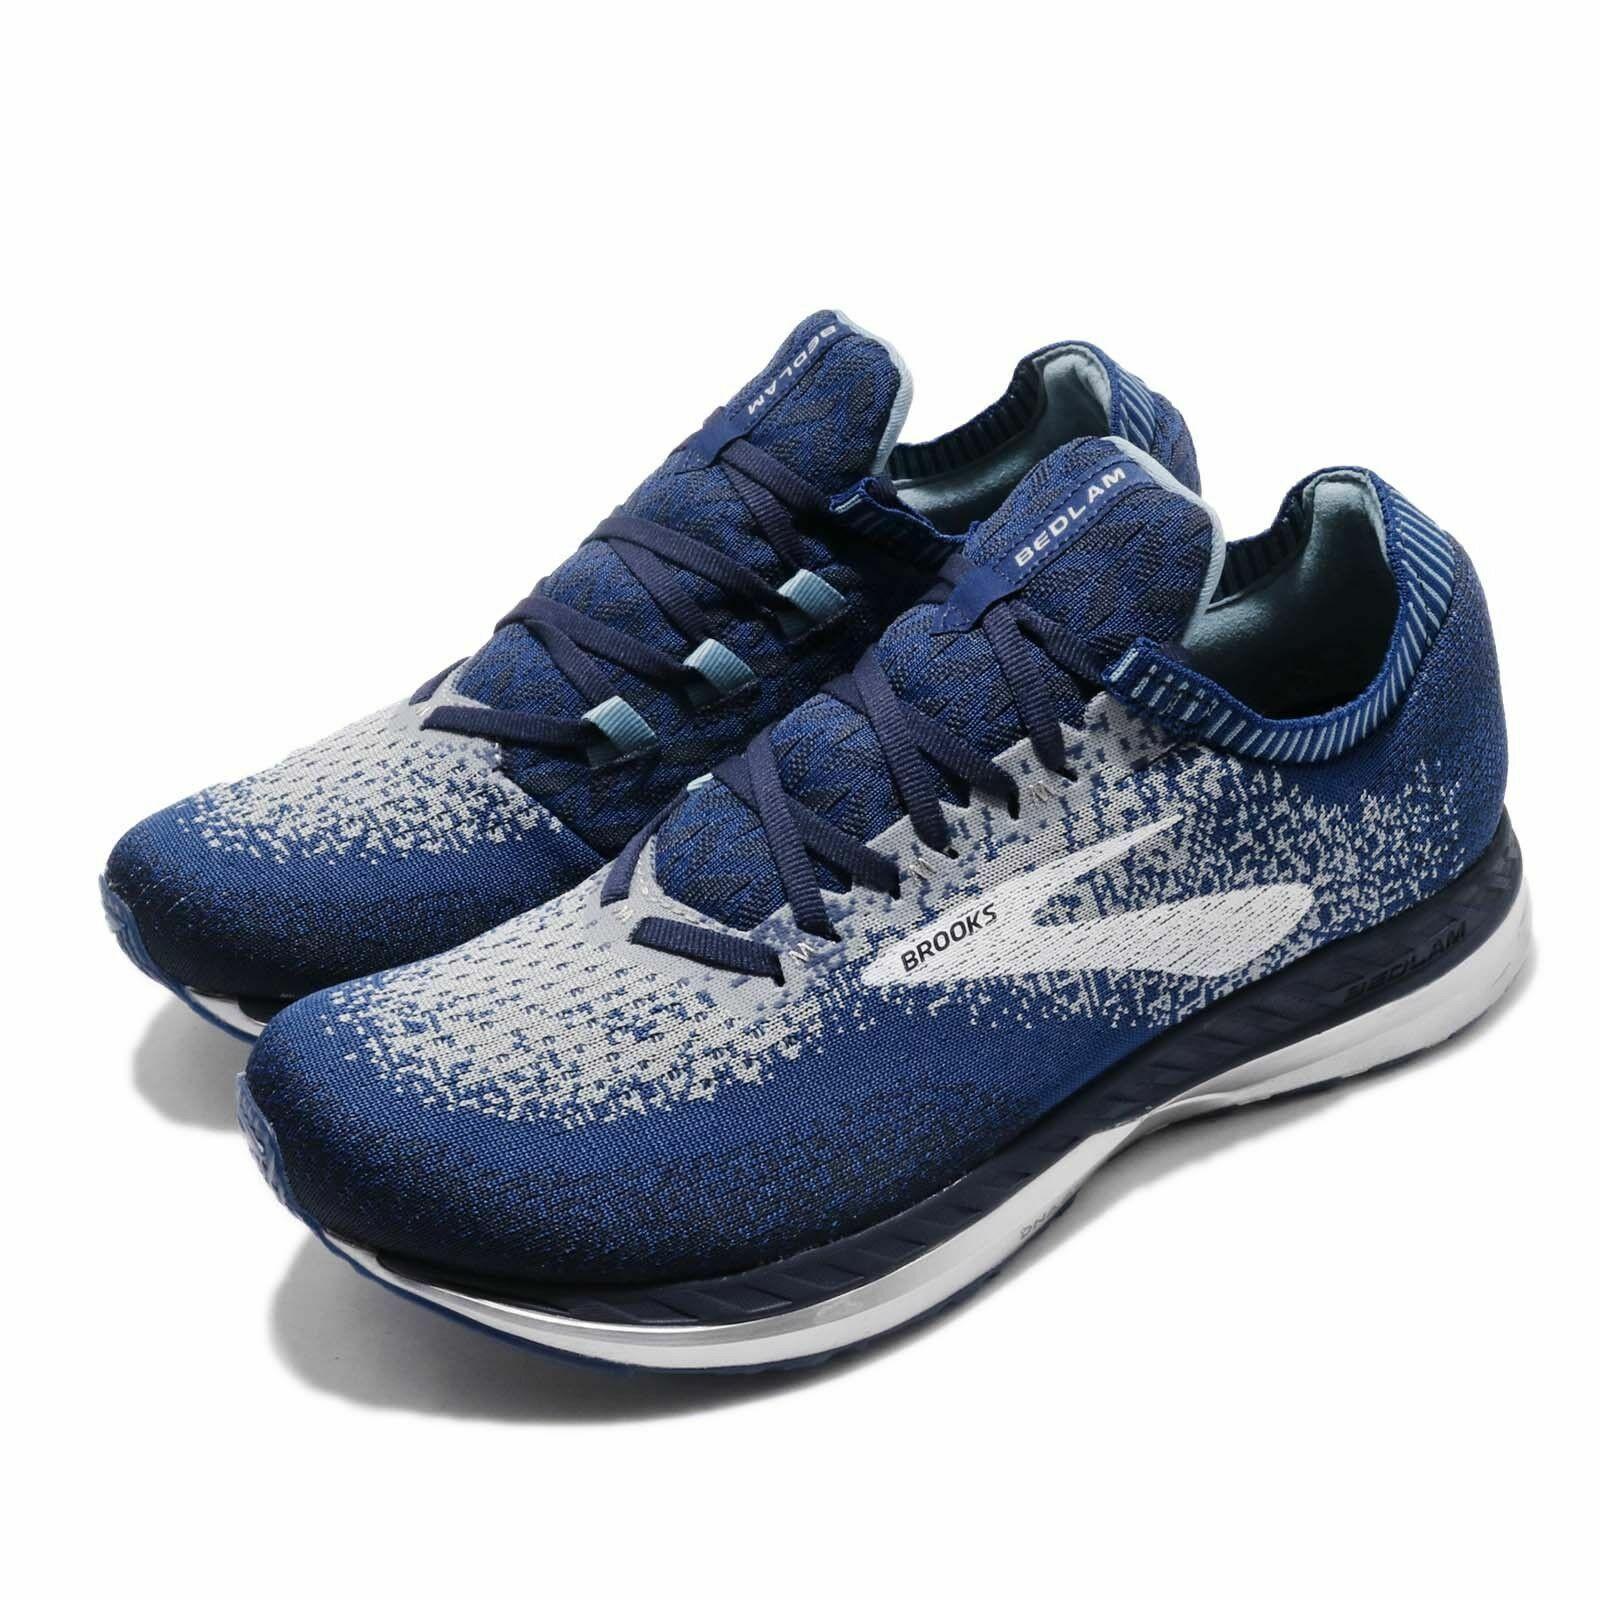 Brooks Bedlam Running Shoes, Men's Sizes 12-12.5-13 Medium,